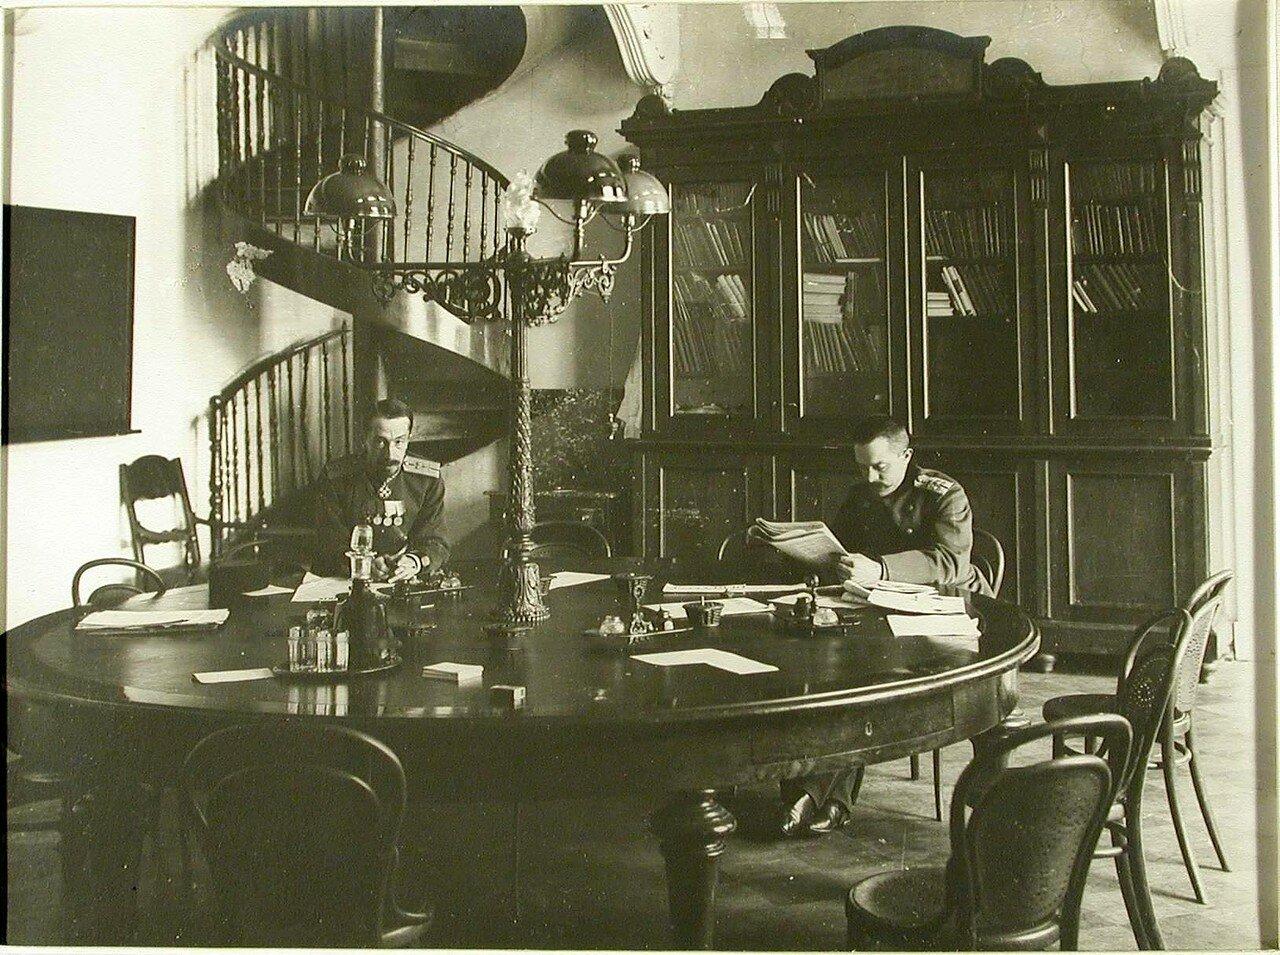 07. Преподаватели за столом в преподавательской комнате; слева - Д.Н.Промтов